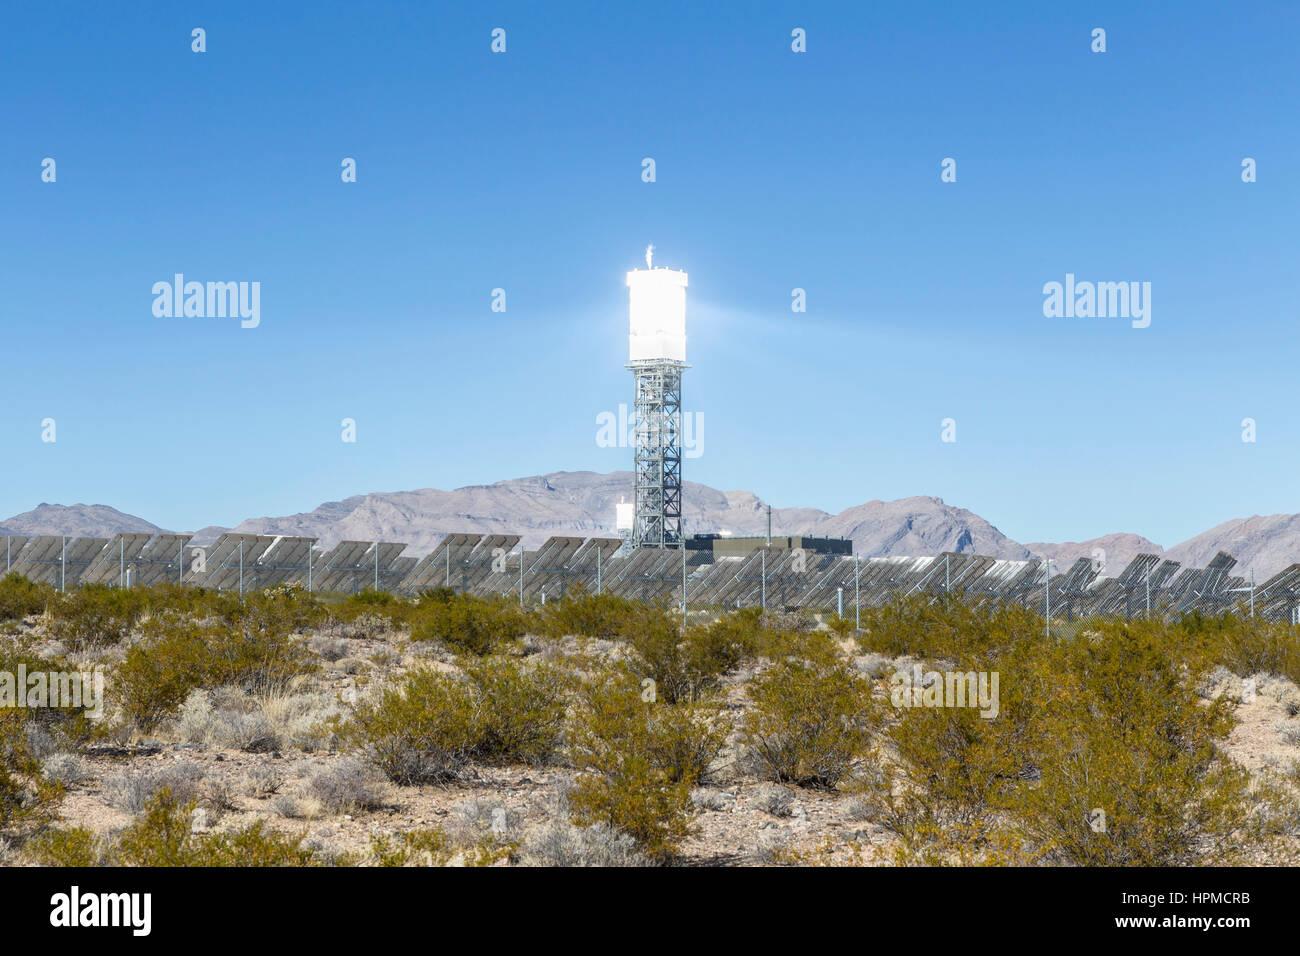 Ivanpah, Kalifornien, USA - 26. November 2014: Reflektierende Solarstrom Turm an das Ivanpah solar-Kraftwerk in Stockbild